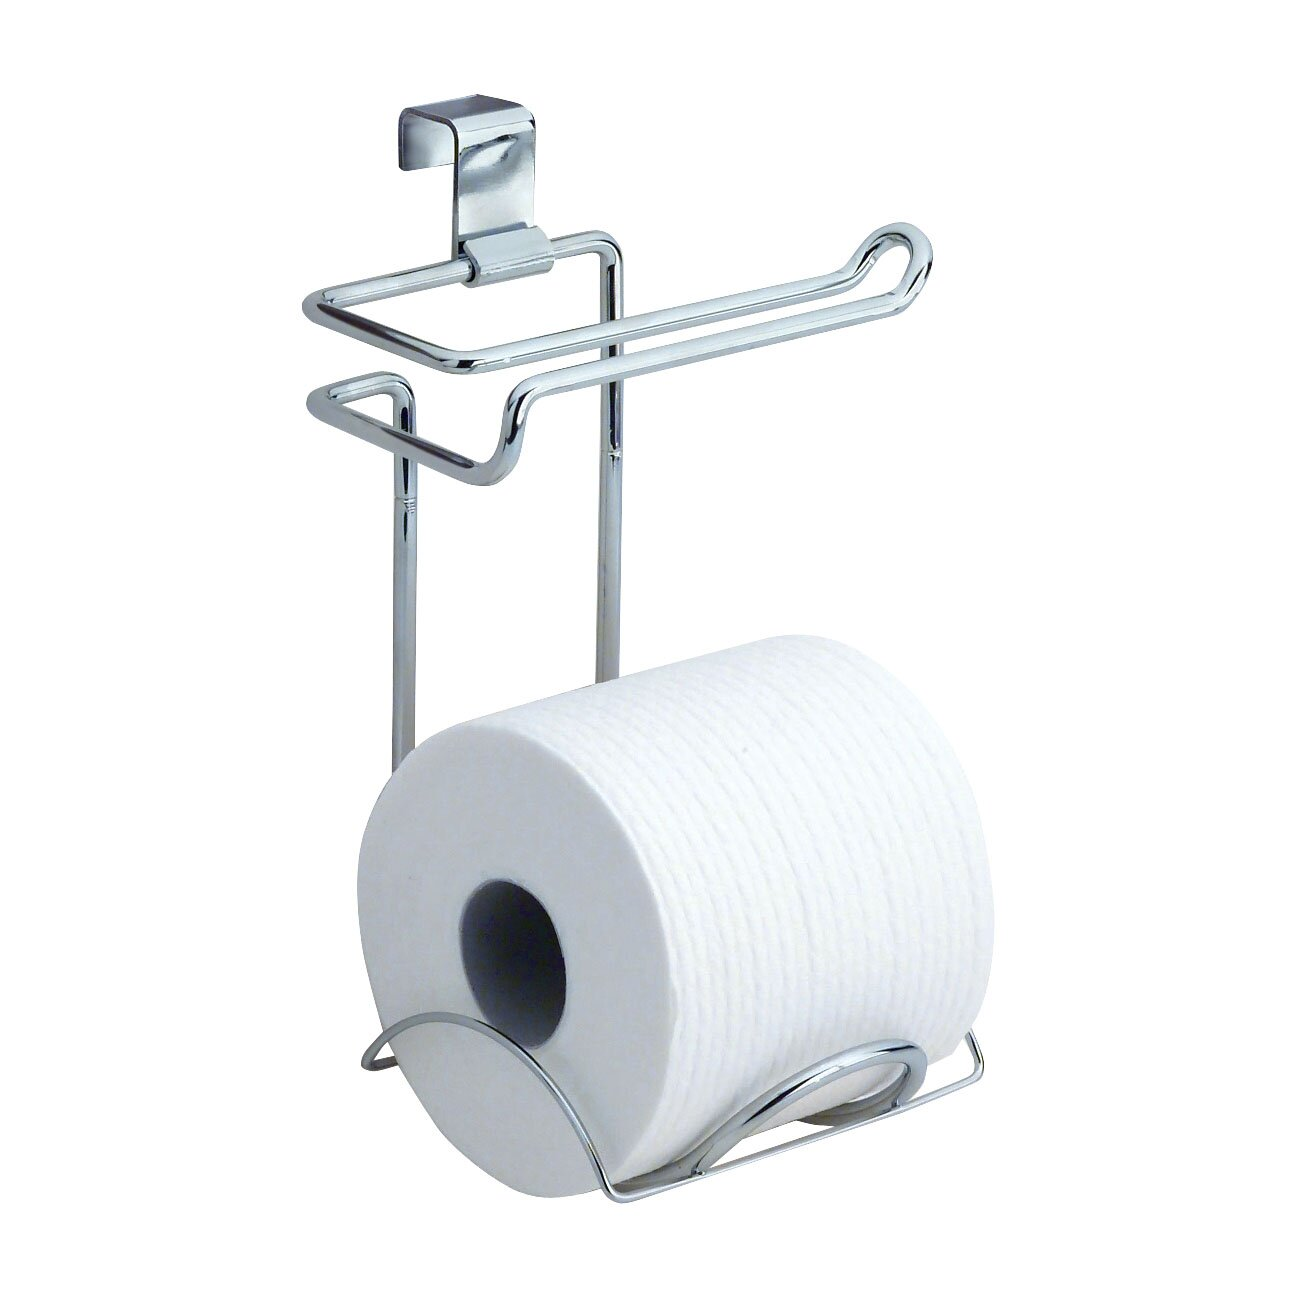 Interdesign classico over the toilet toiletpaper holder reviews wayfair - Interdesign toilet paper holder ...